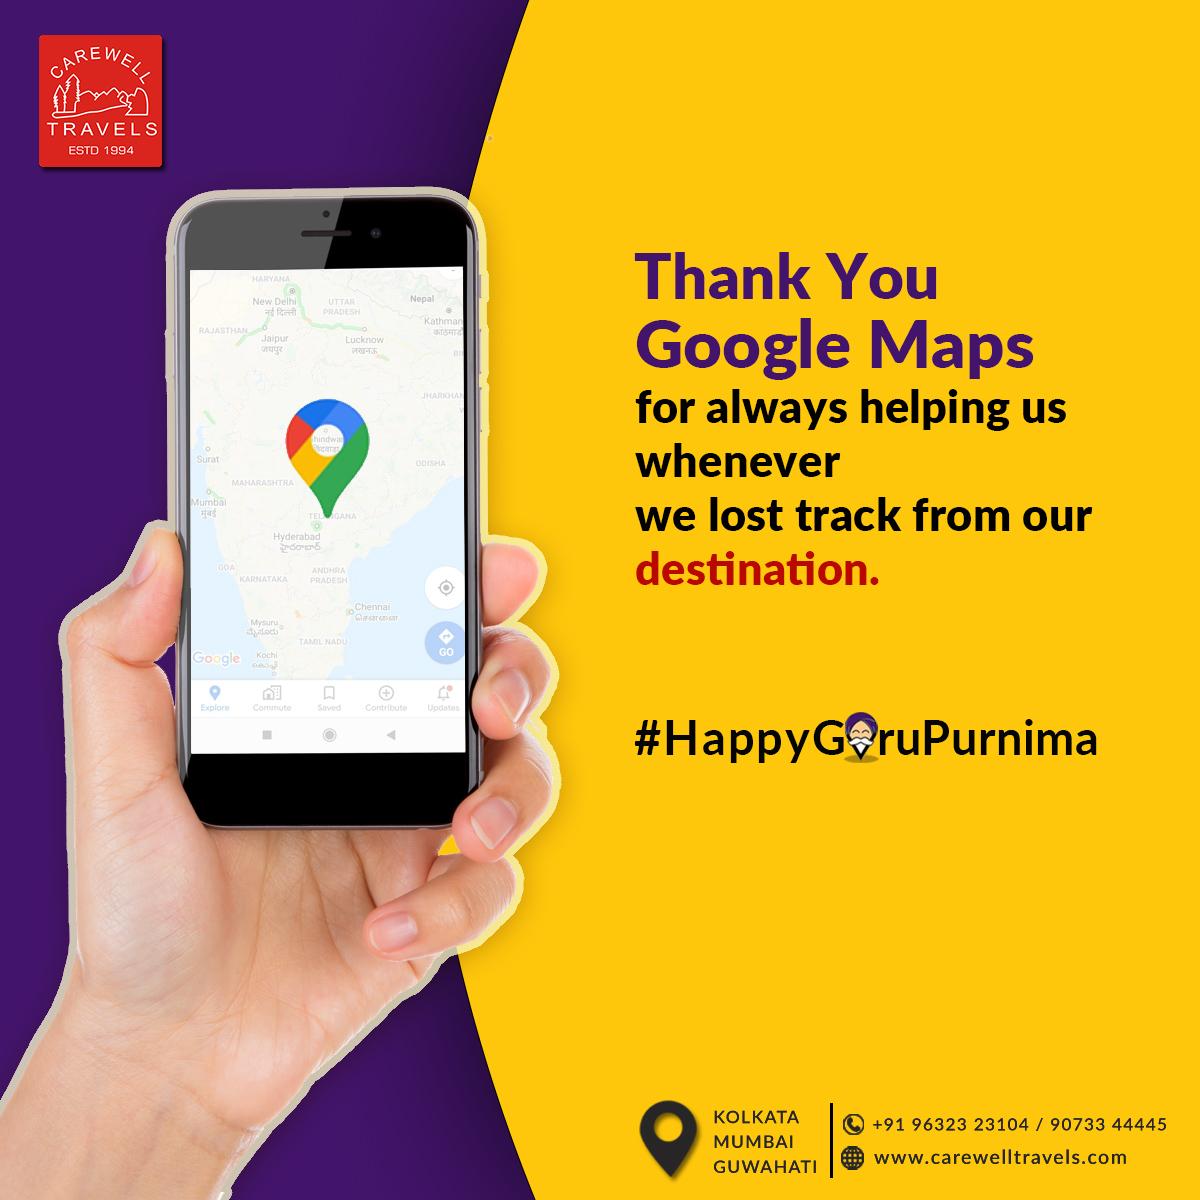 The #TravelGuru who always guides you to the right destination .  #GuruPurnima #GoogleMaps  #CarewellTravels #TravelAgency #Kolkata #Mumbai #Guwahati #GoogleNavigation #CareBeyondComparepic.twitter.com/6KnUl9Hge8